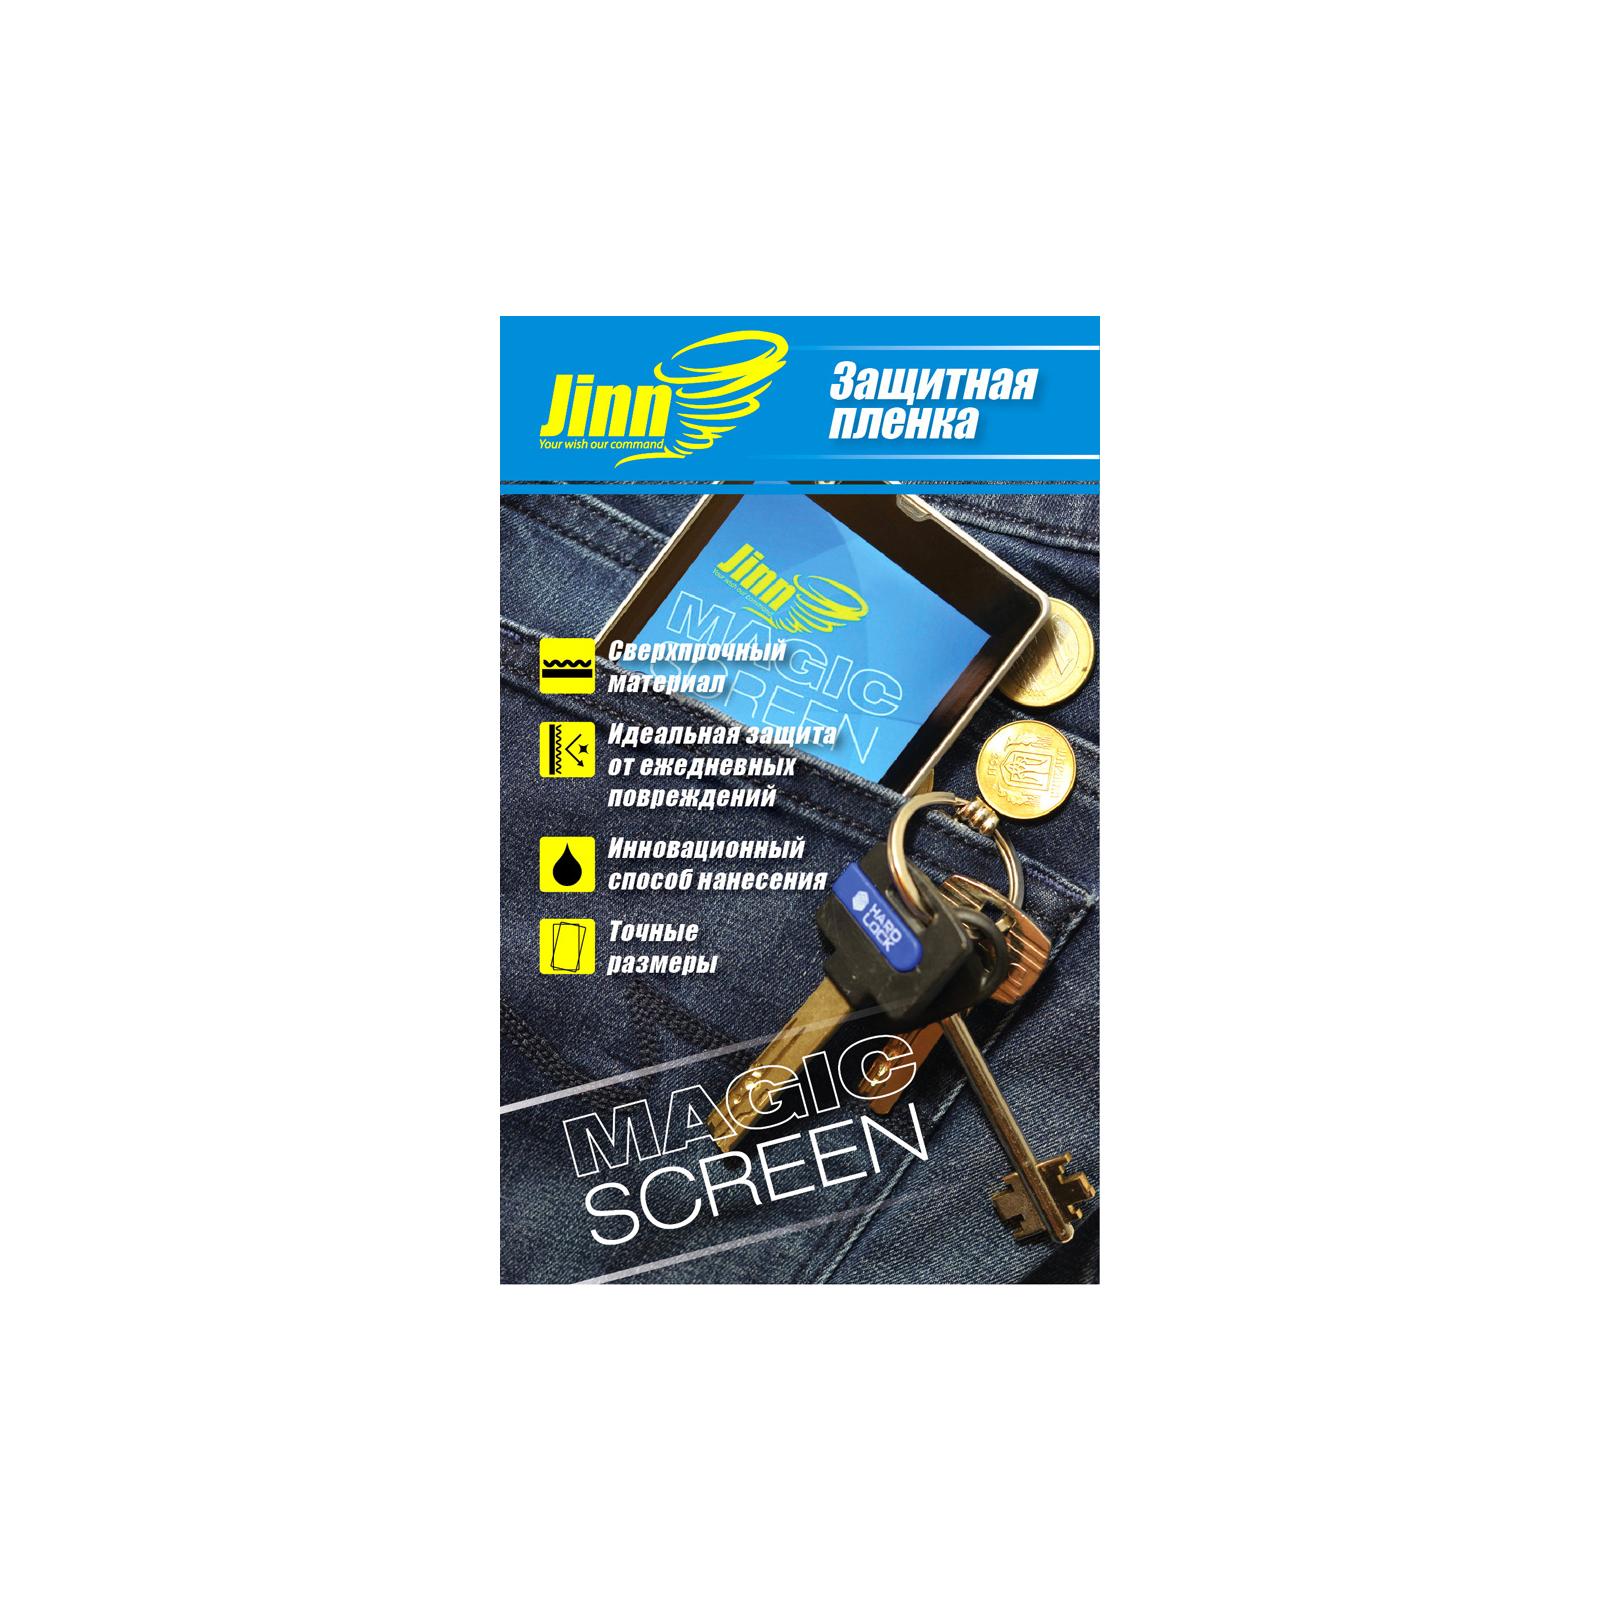 Пленка защитная JINN ультрапрочная Magic Screen для Fly IQ443 Trend (Fly IQ443 Trend front)